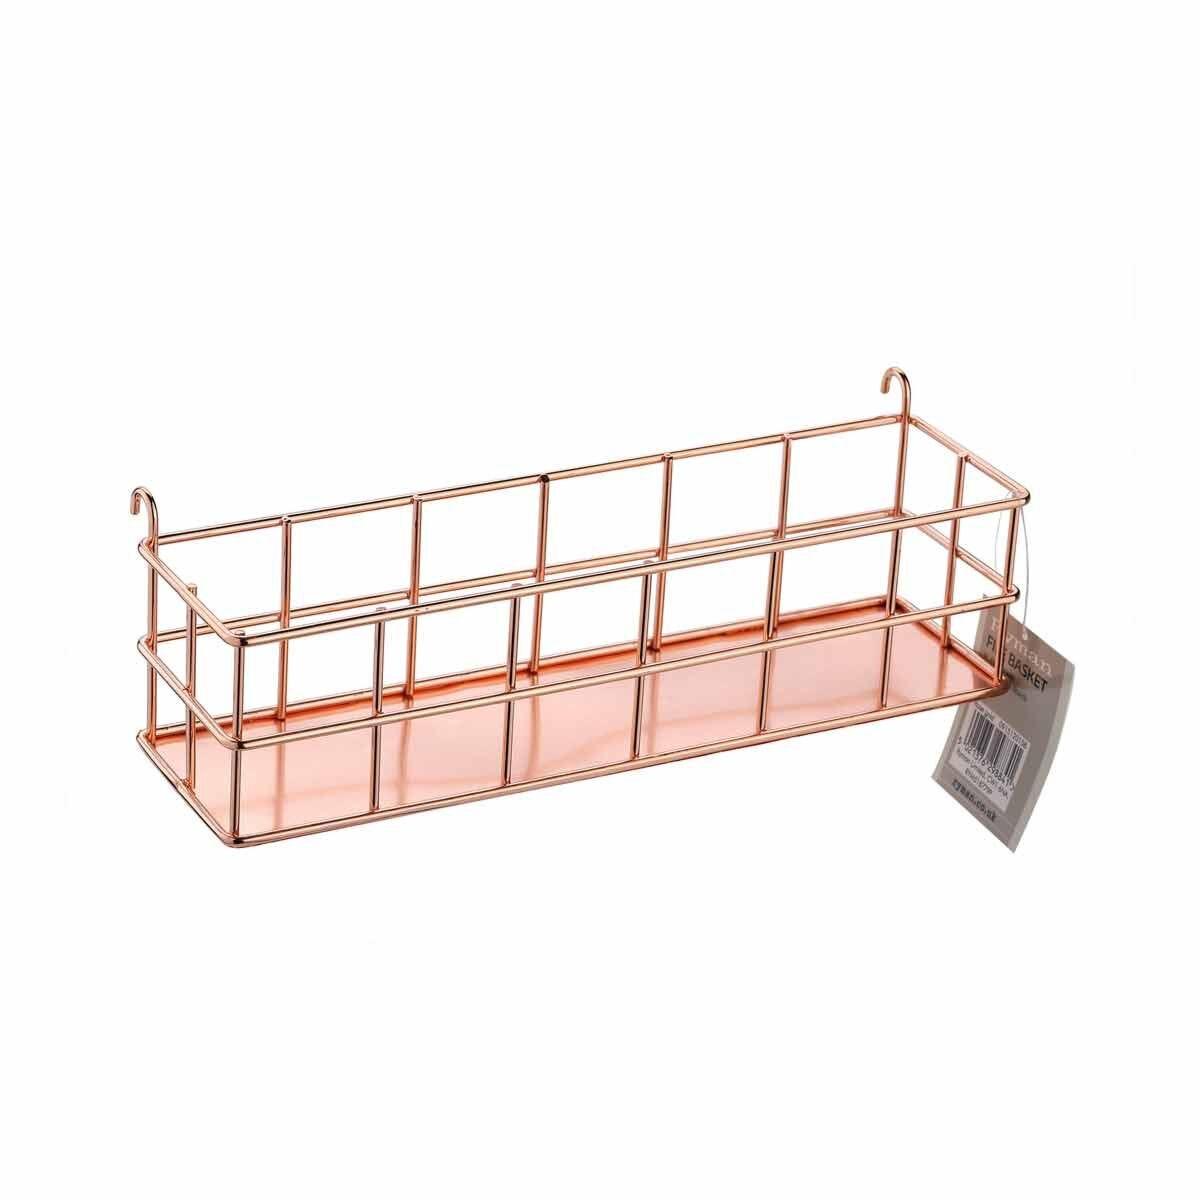 Ryman Memo Board Wire Basket Rose Gold